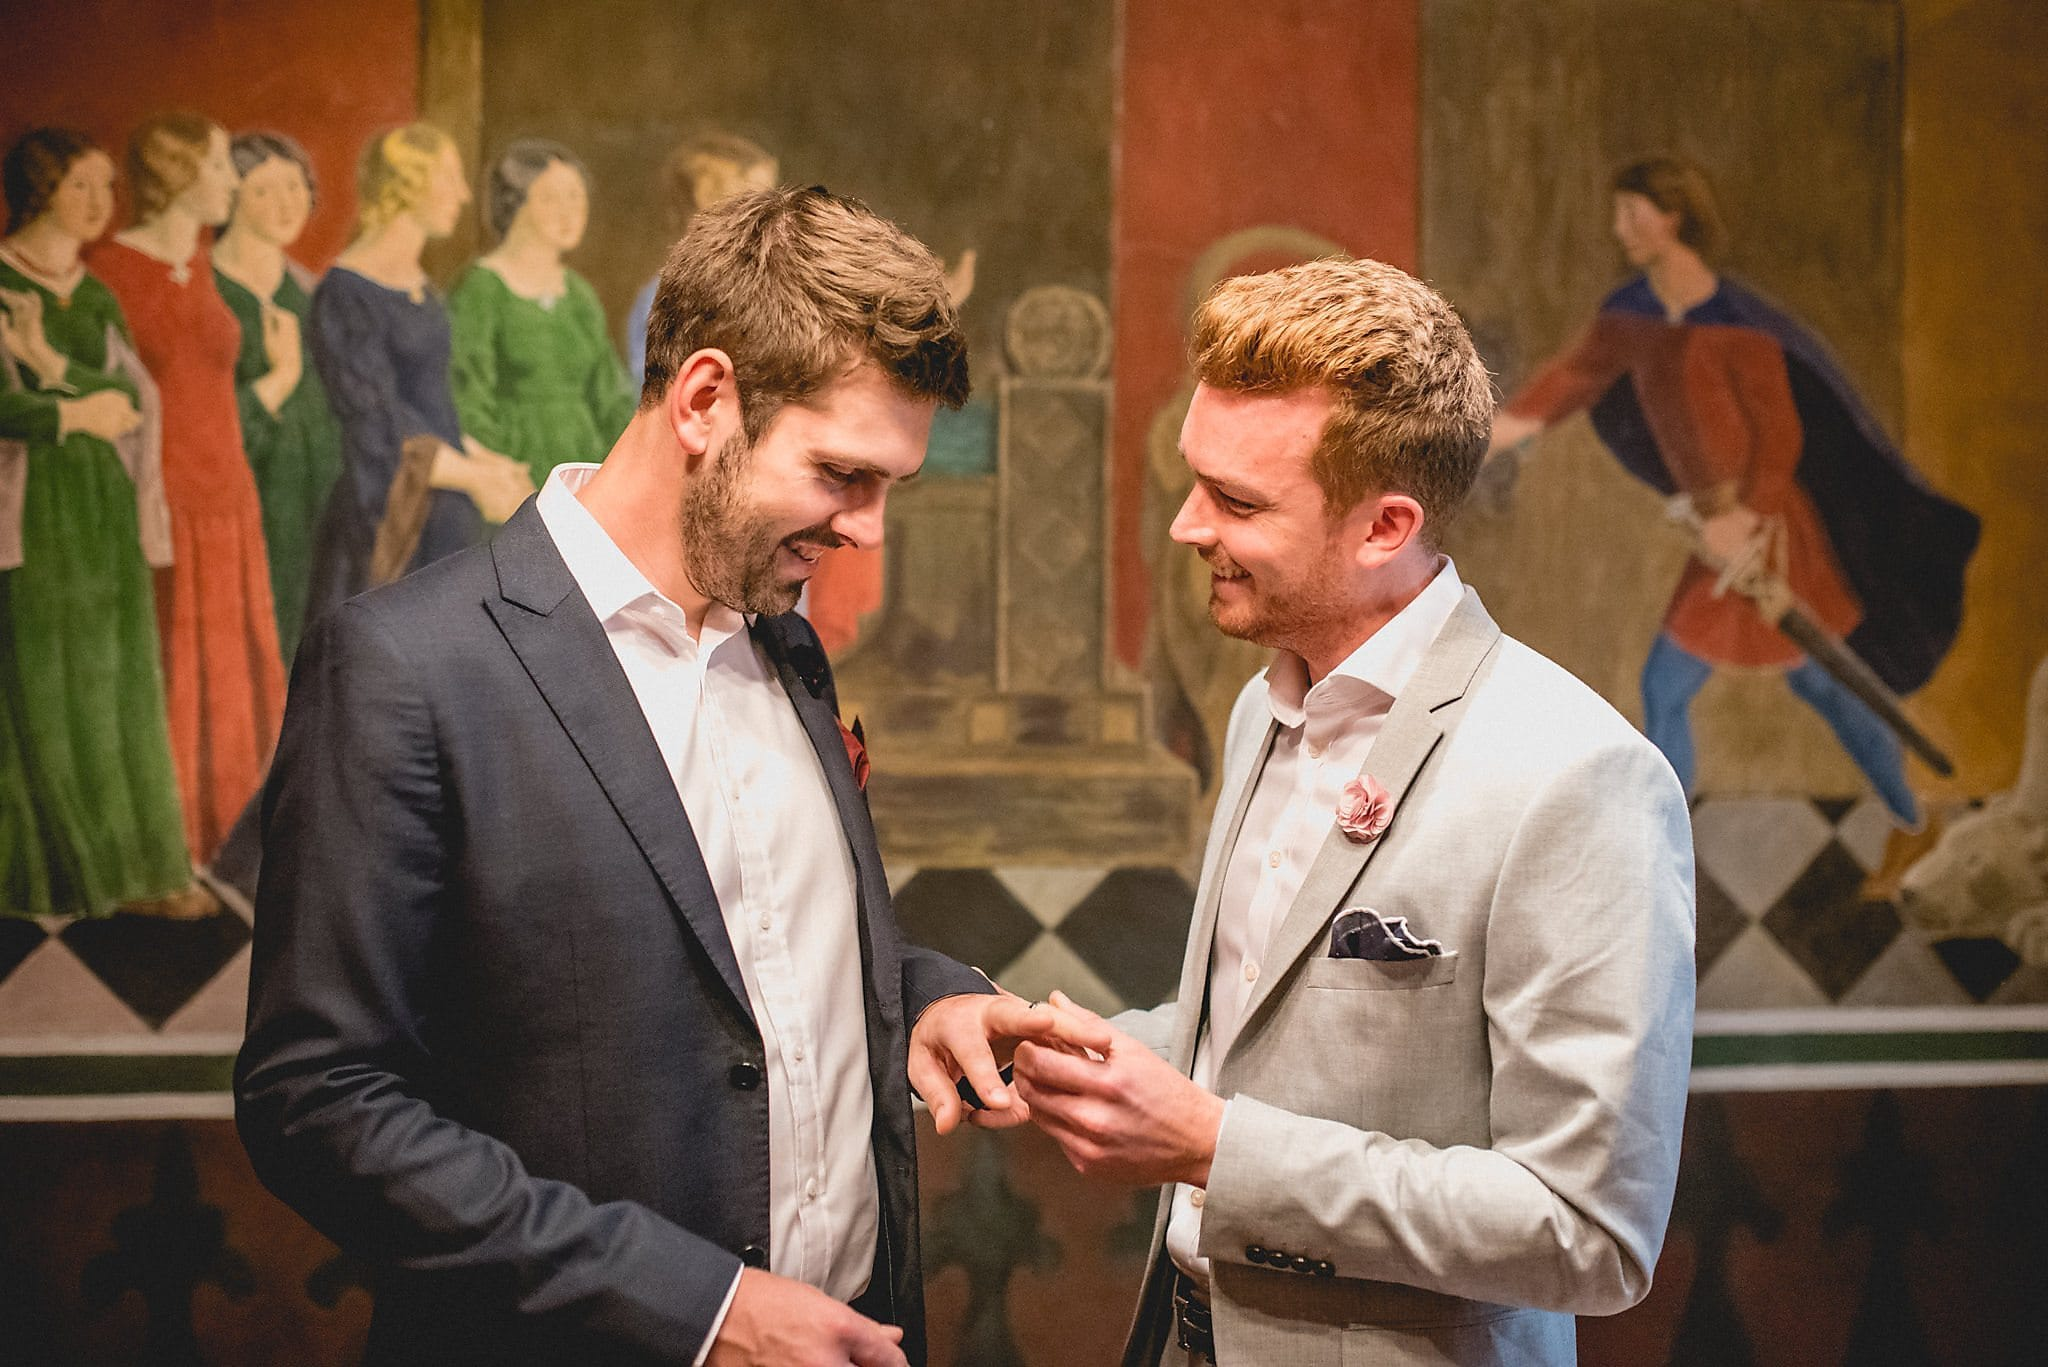 2 grooms exchange rings at their Elopement wedding at the Copenhagen Rådhus registry